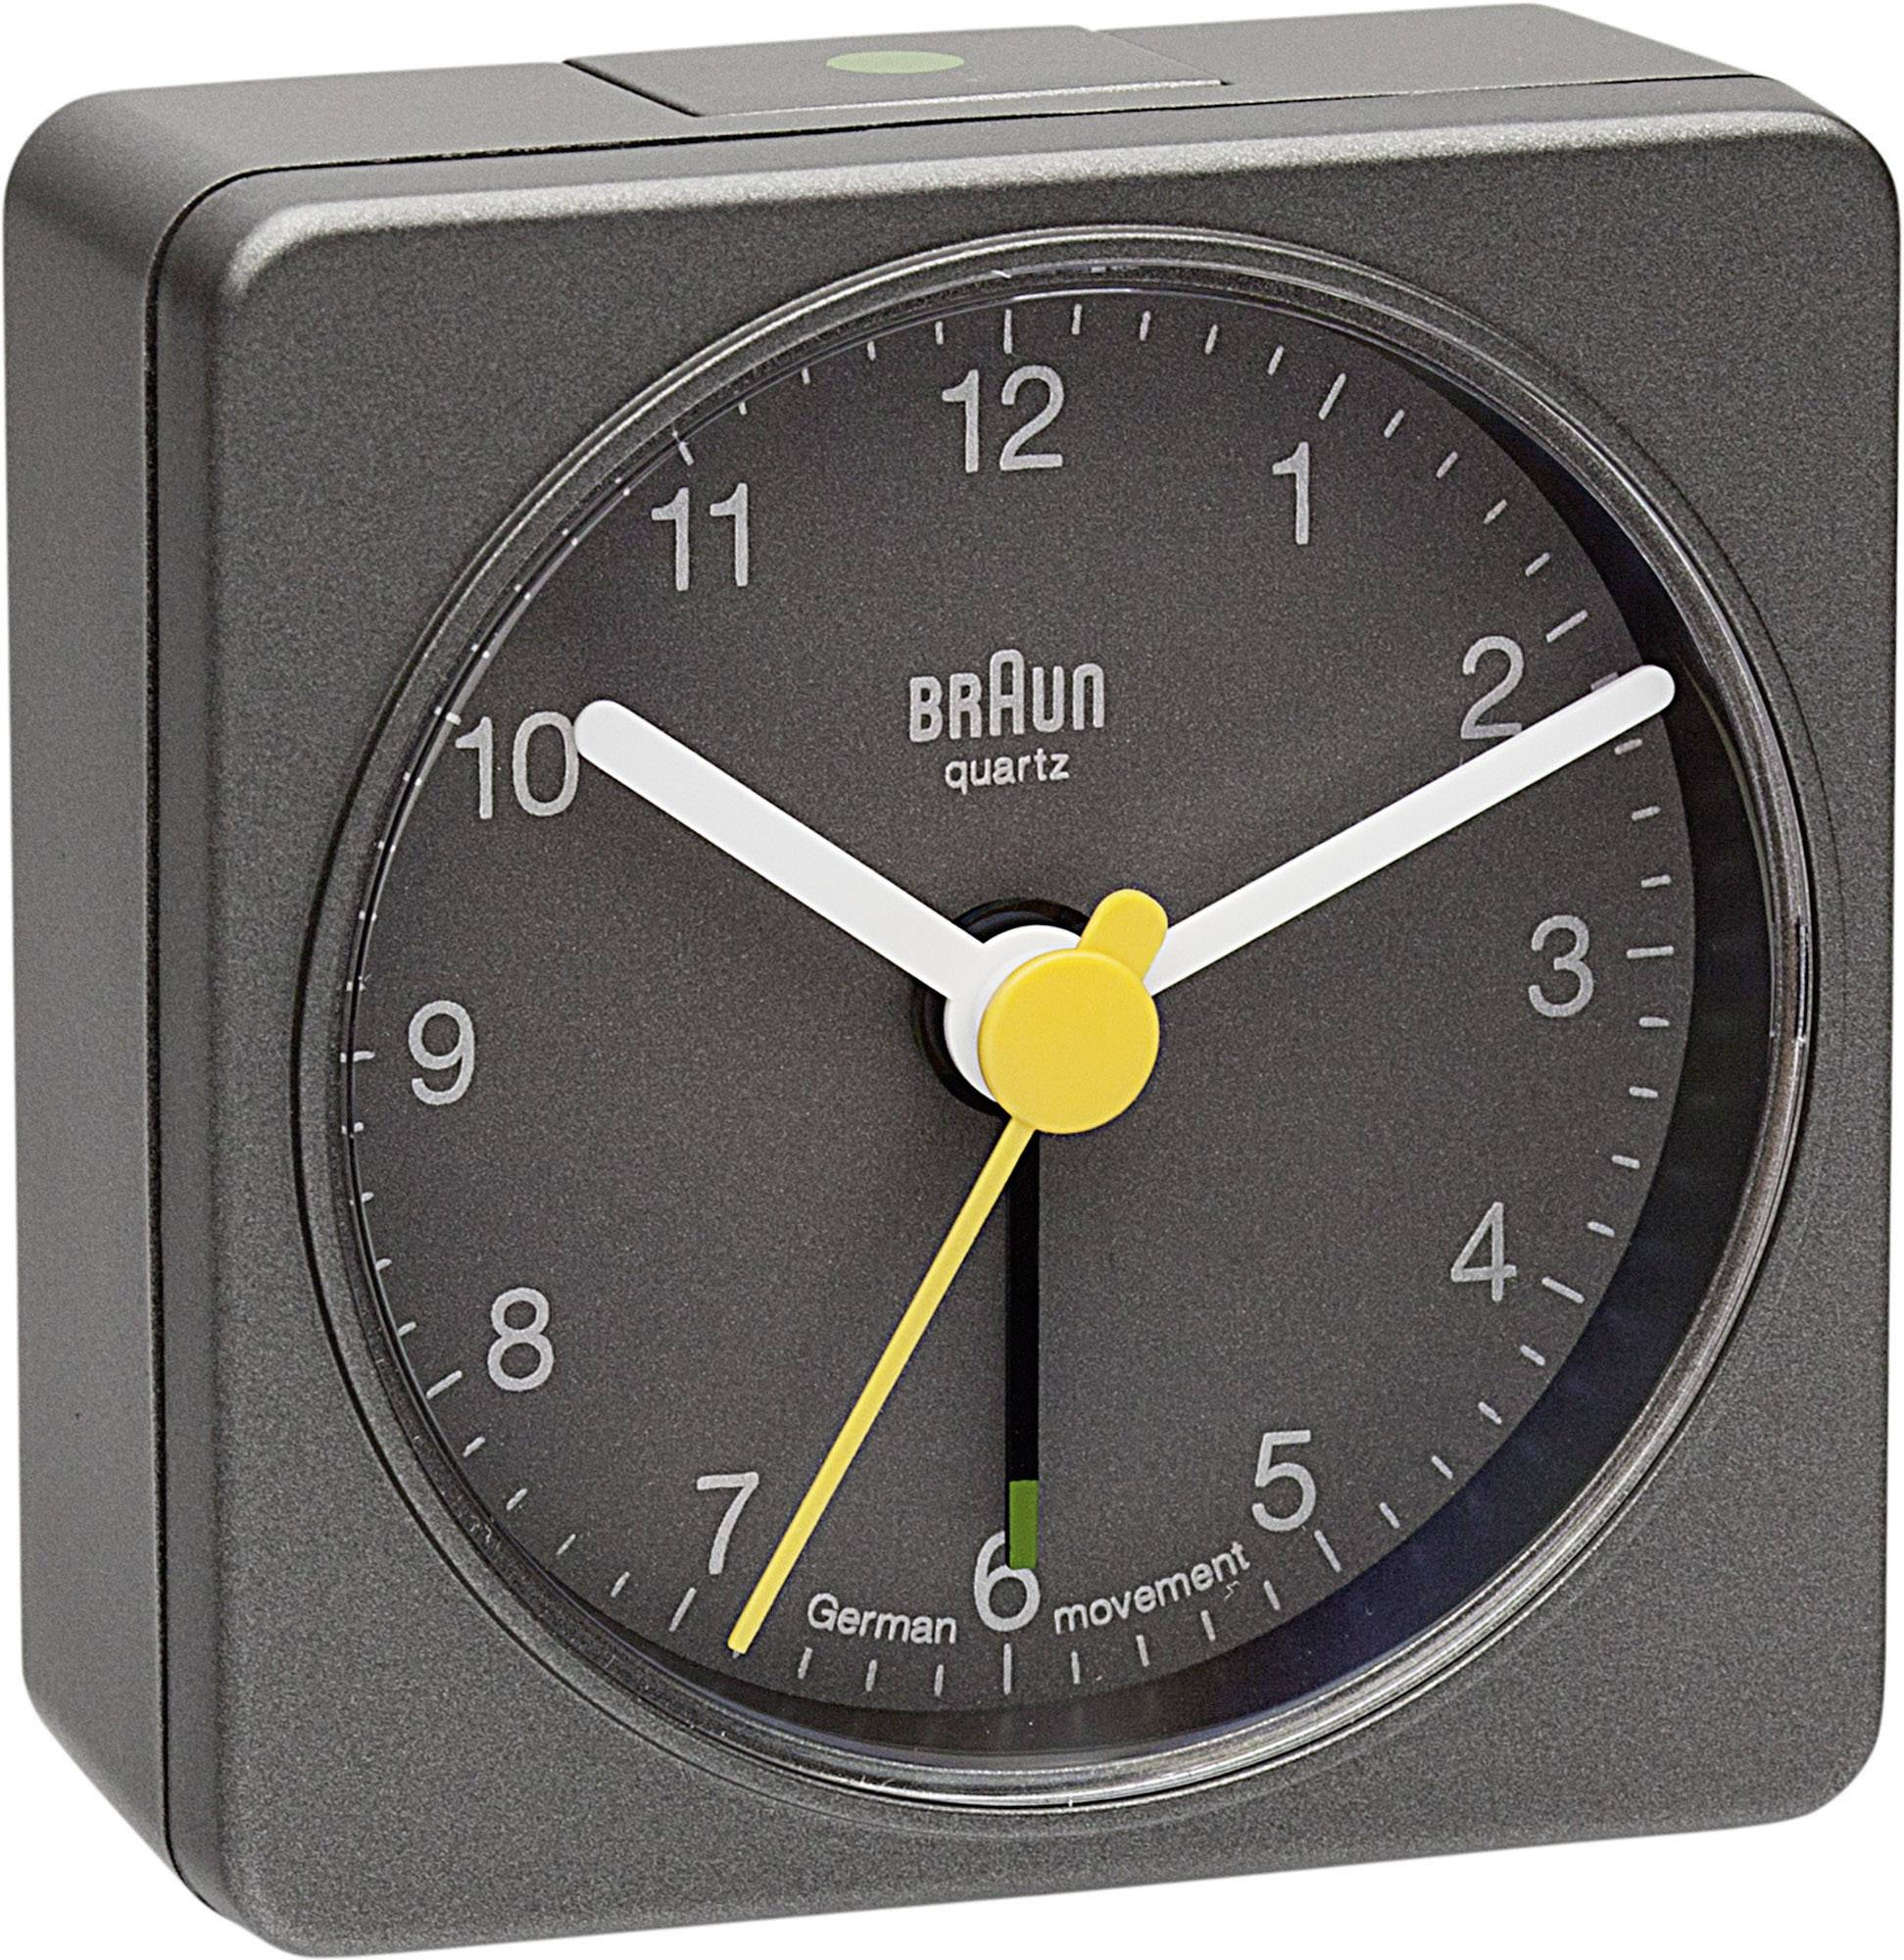 Analogový budík Braun, 66031, 56 x 56 x 27 mm